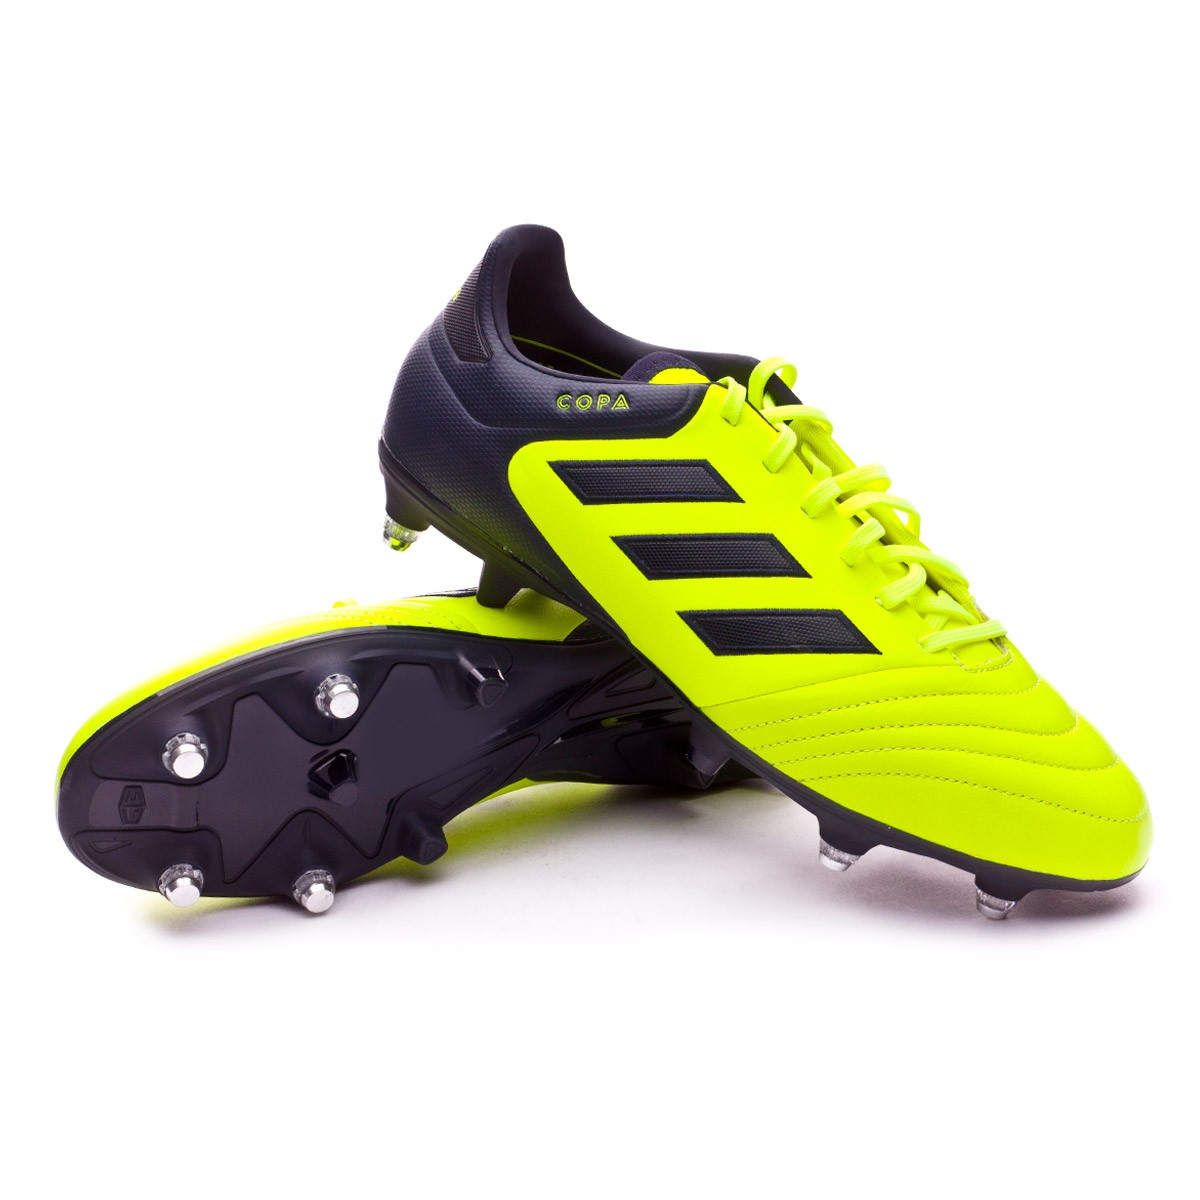 finest selection c21f4 ee200 Chaussure de foot adidas Copa 17.2 SG Solar yellow-Legend ink - Boutique de  football Fútbol Emotion